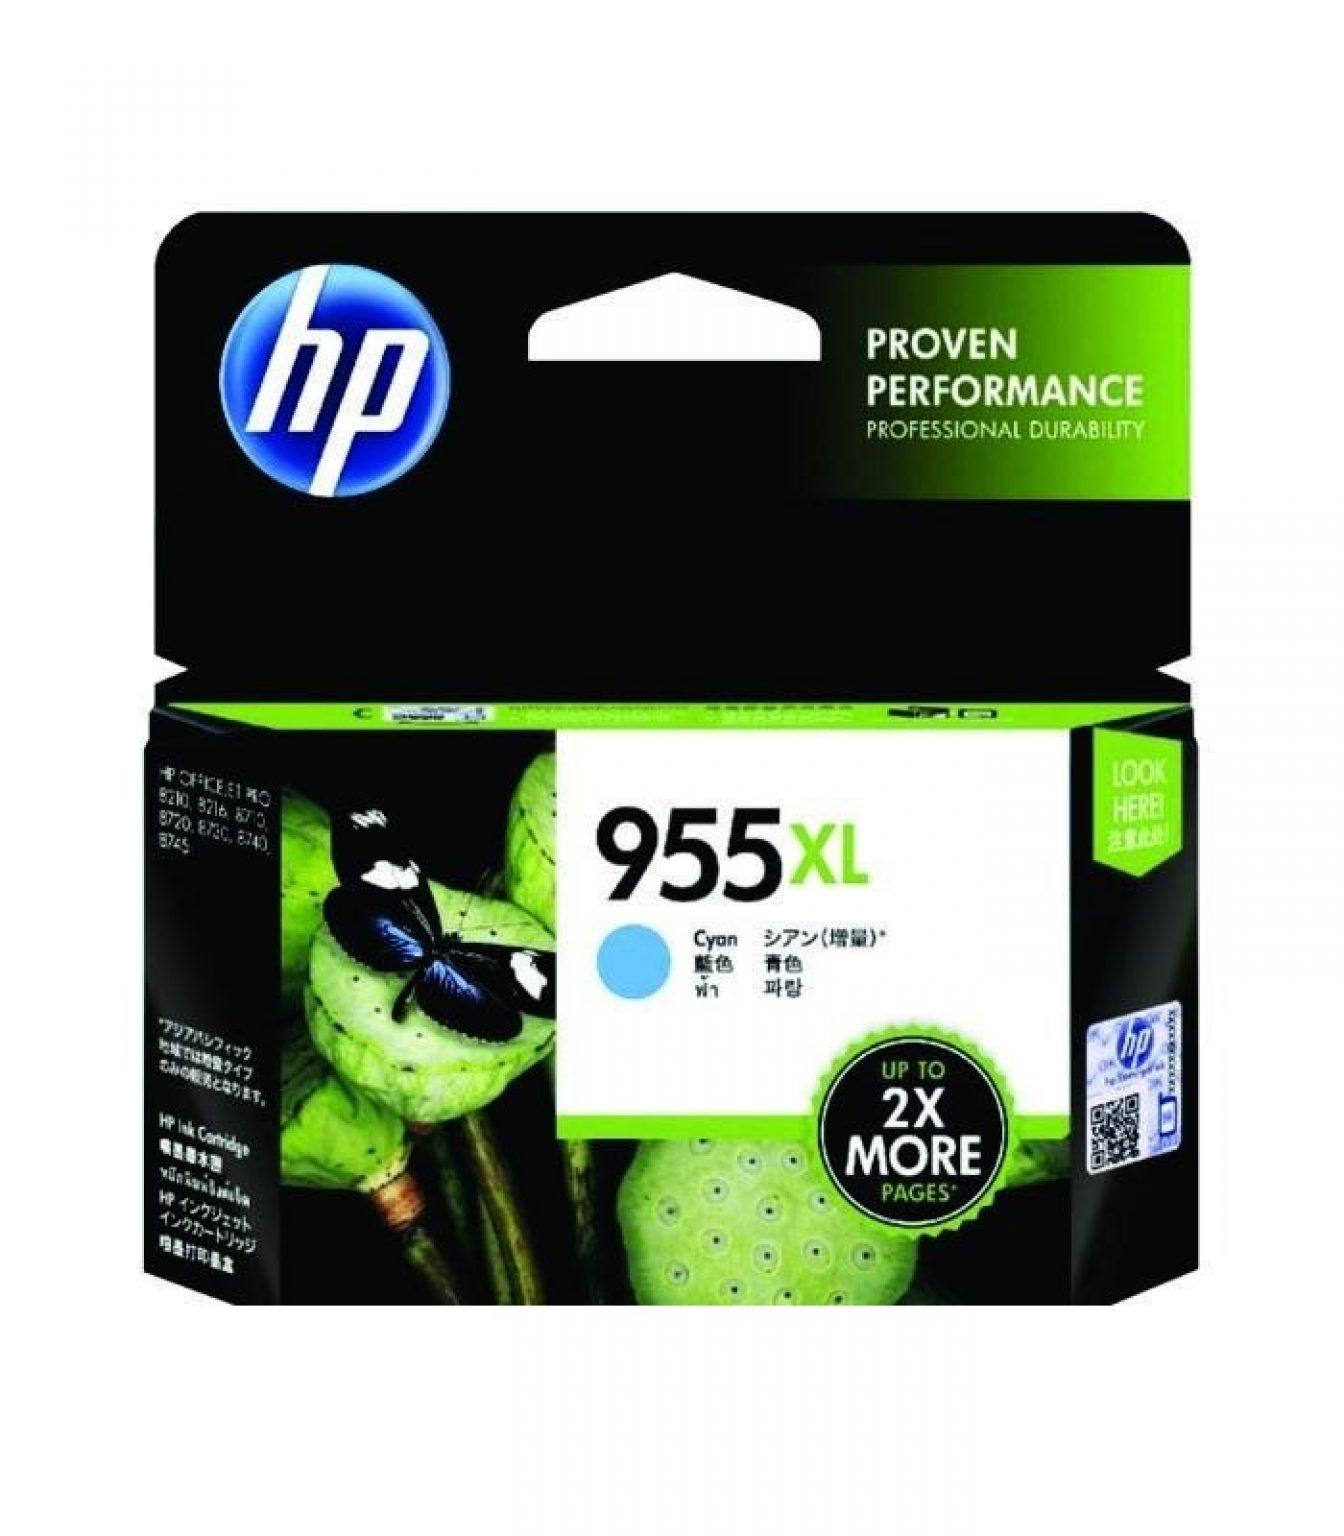 HP - 955XL Cyan Original Ink Cartridge [L0S63AA]